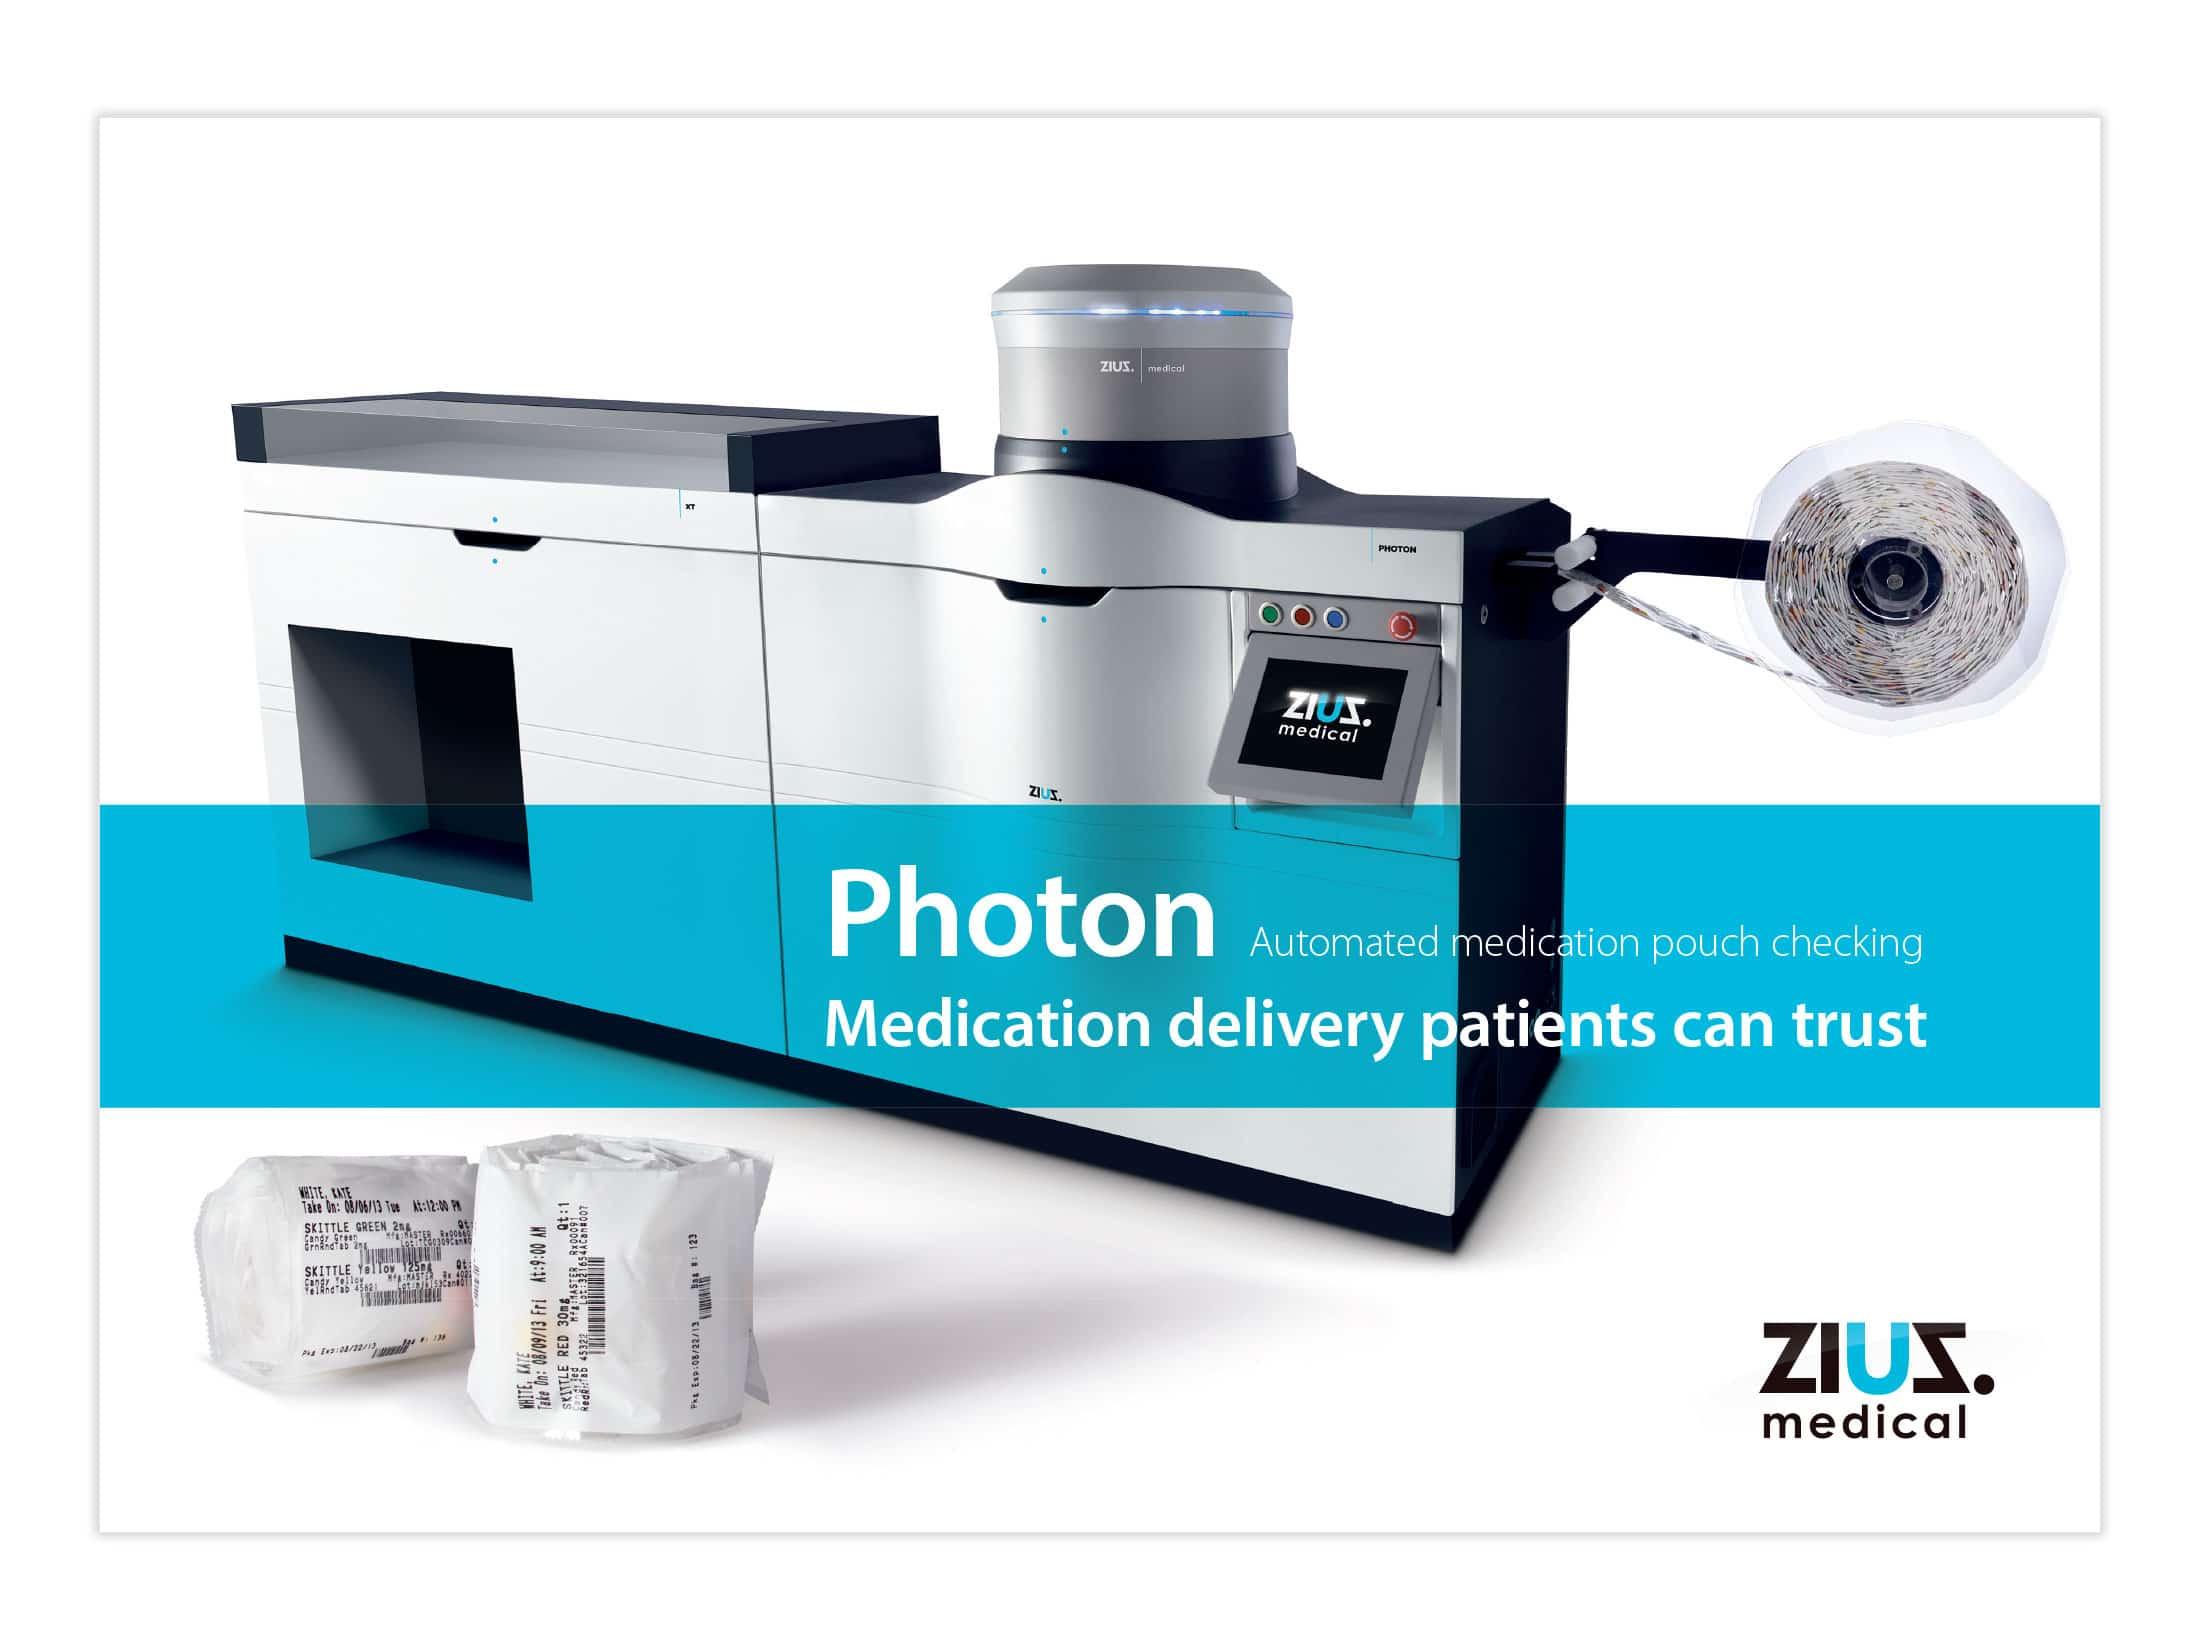 Brochure Photon 1 | ZiuZ Medical - Photon brochure